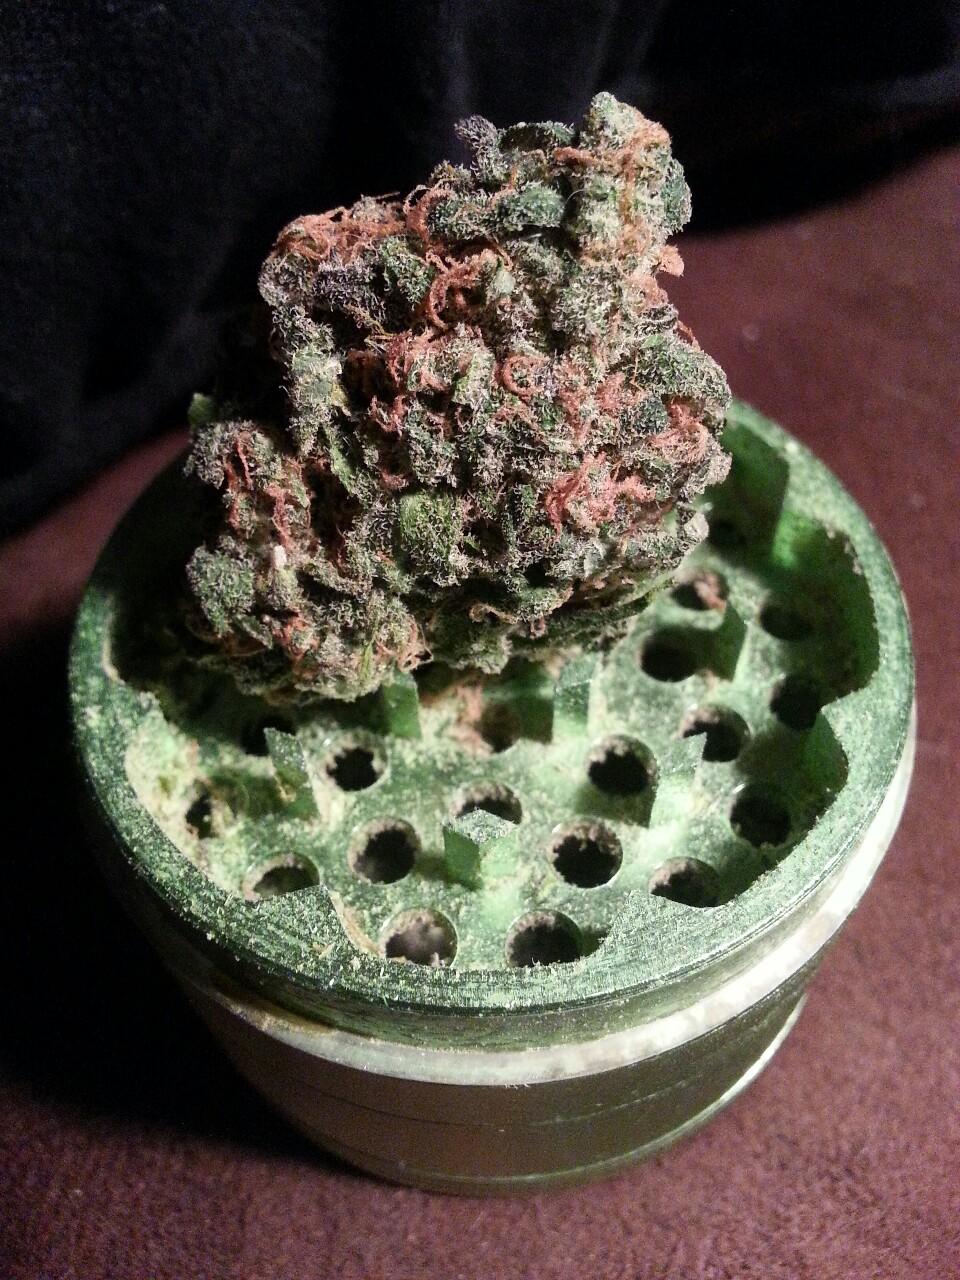 afrutadas variedades cannabis royal queen seeds